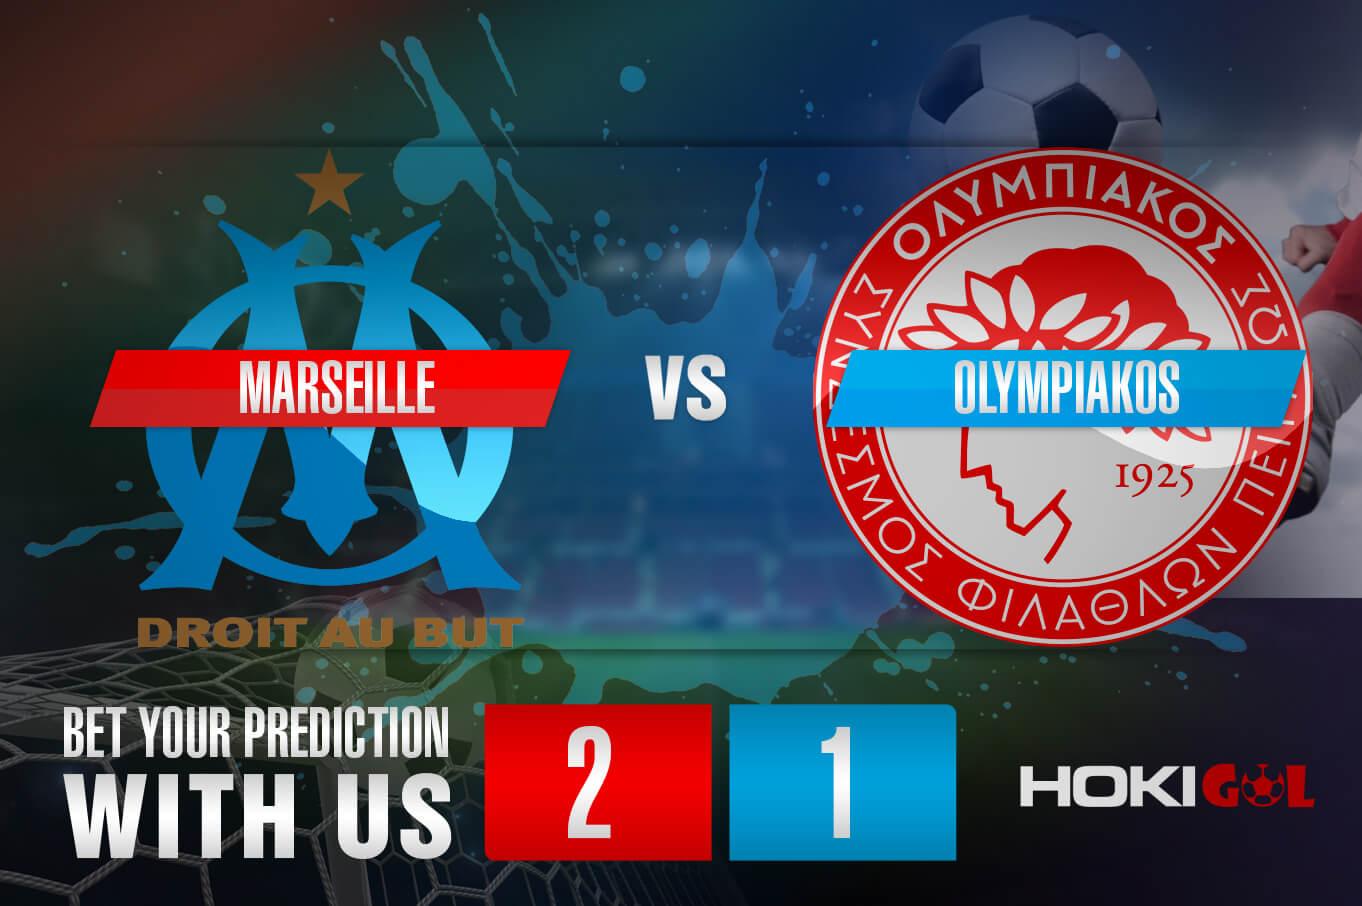 Prediksi Bola Marseille Vs Olympiakos 2 Desember 2020